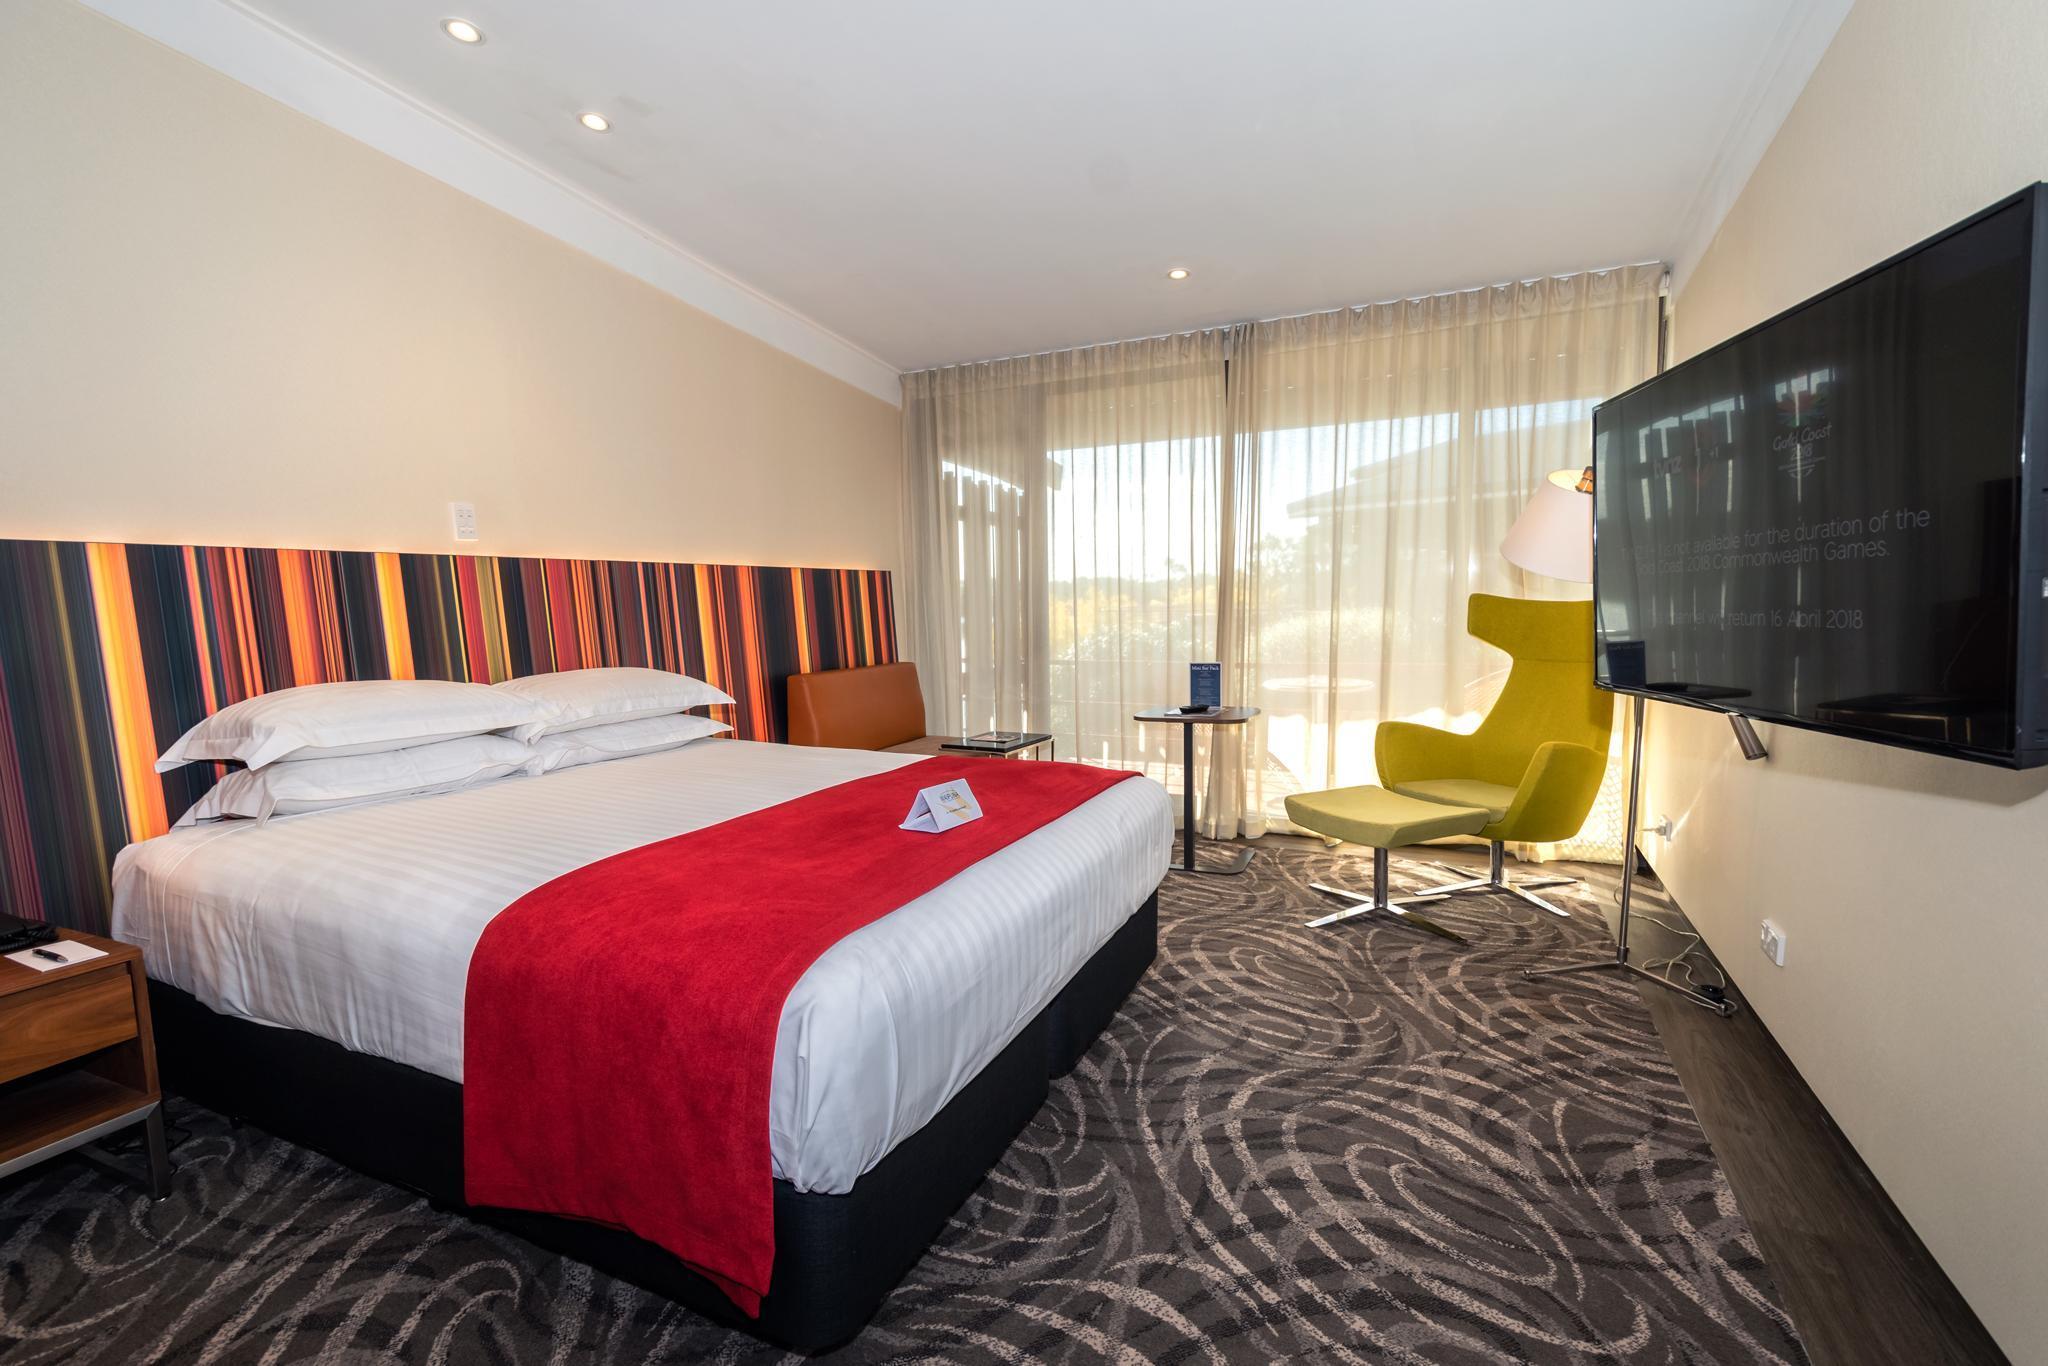 Waipuna Hotel & Conference Centre, Waitakere